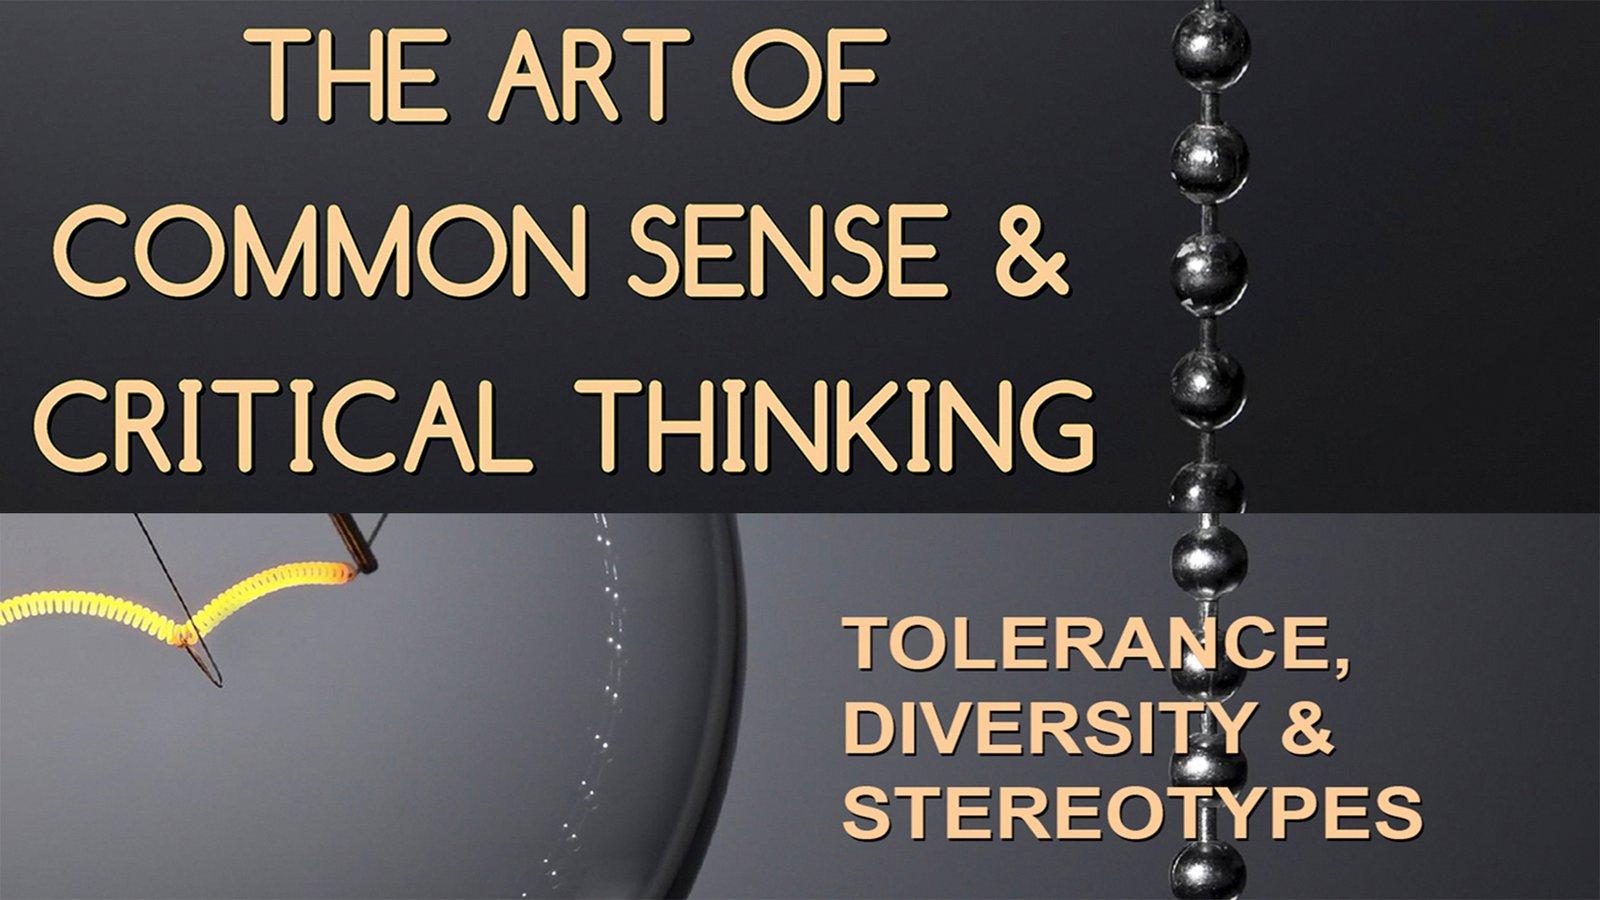 Employee Training The Art of Common Sense & Critical Thinking: Tolerance, Diversity & Stereotypes